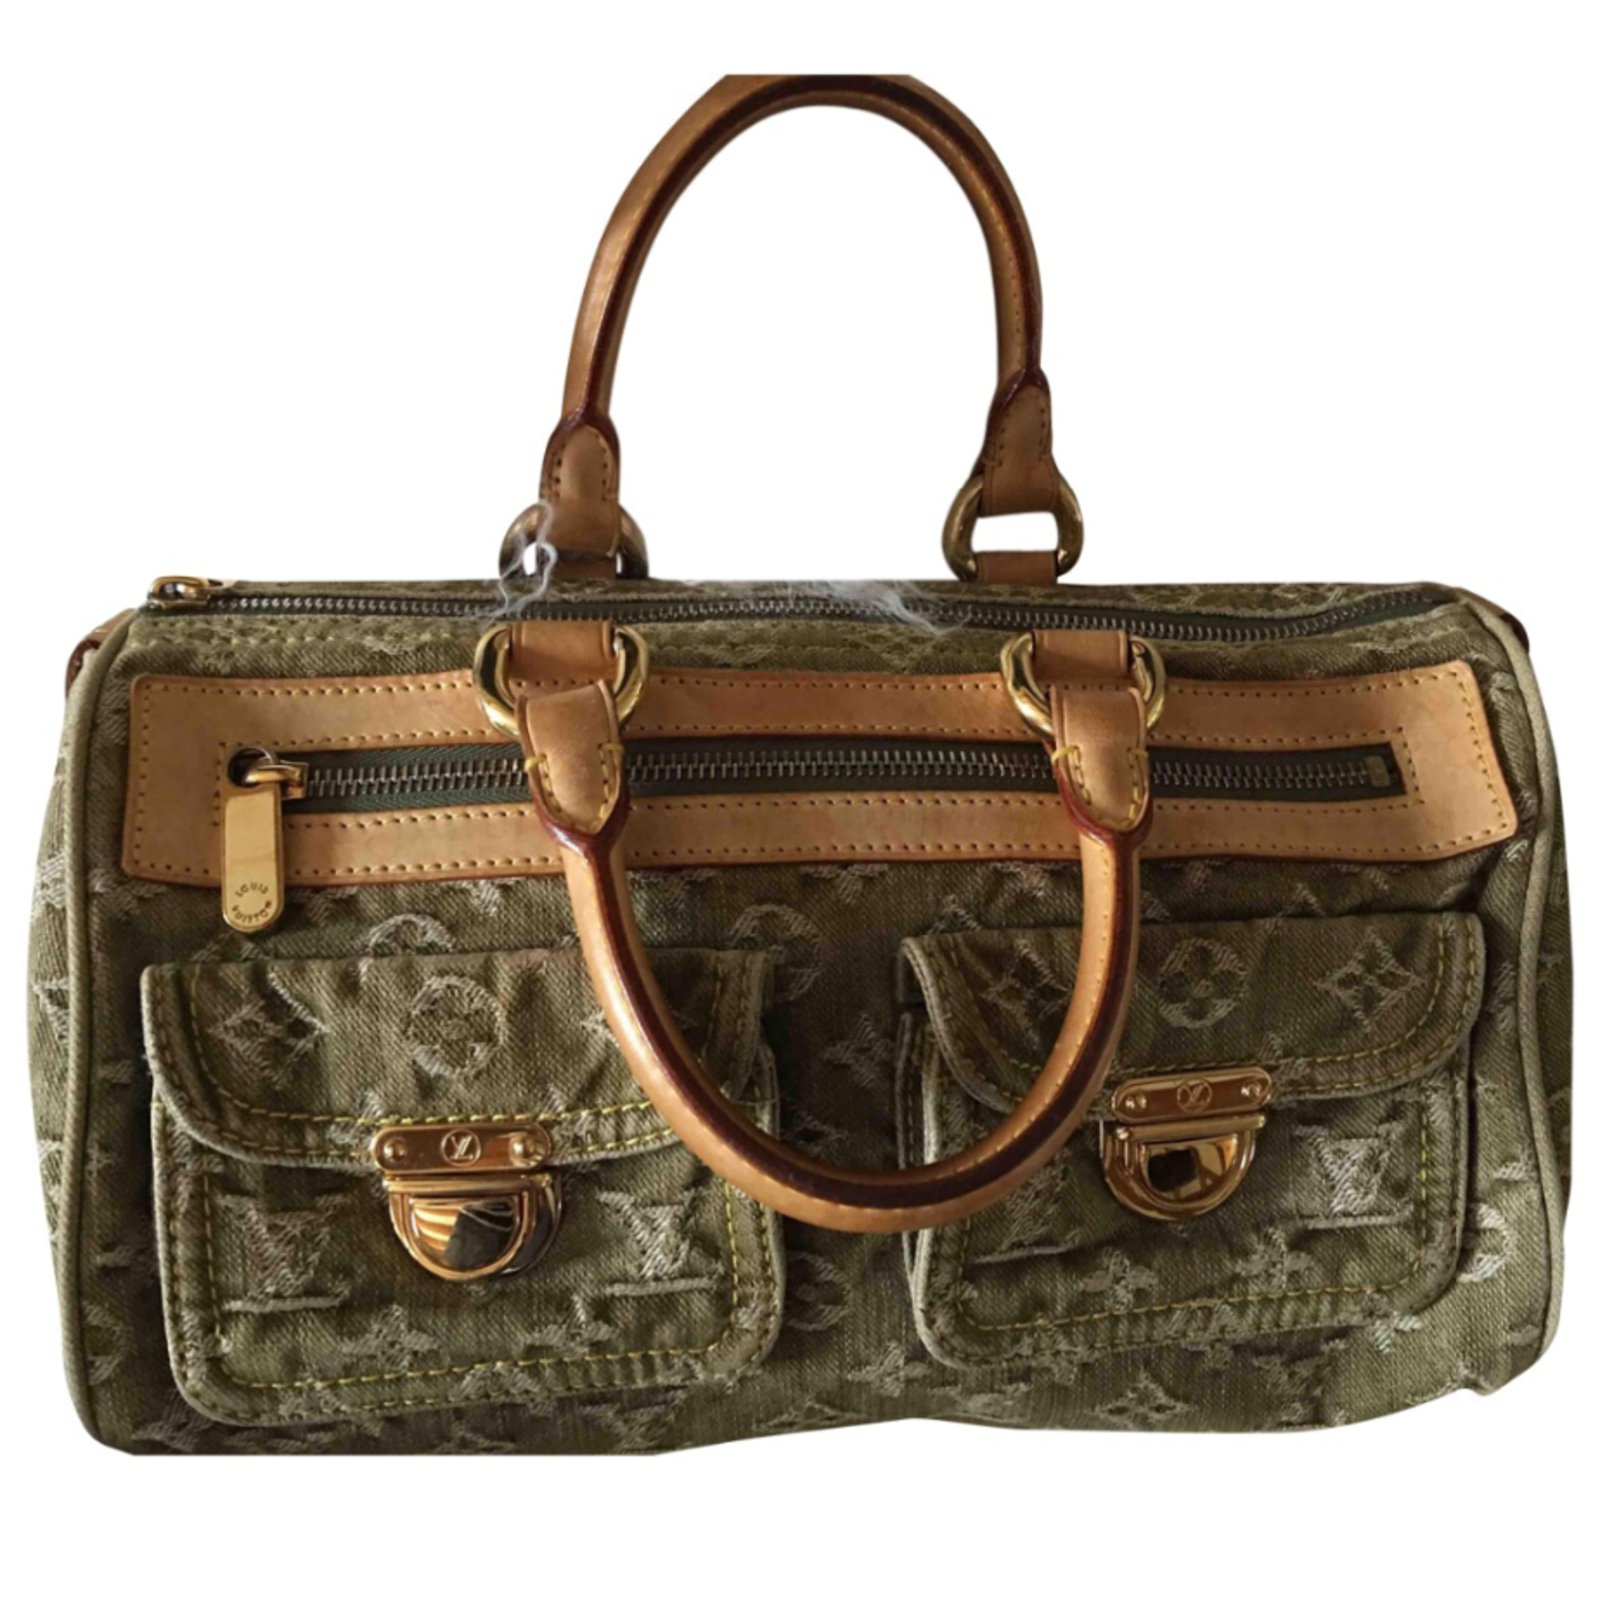 Louis Vuitton Néo speedy Handbags Denim Khaki ref.58171 - Joli Closet 1ce52286373